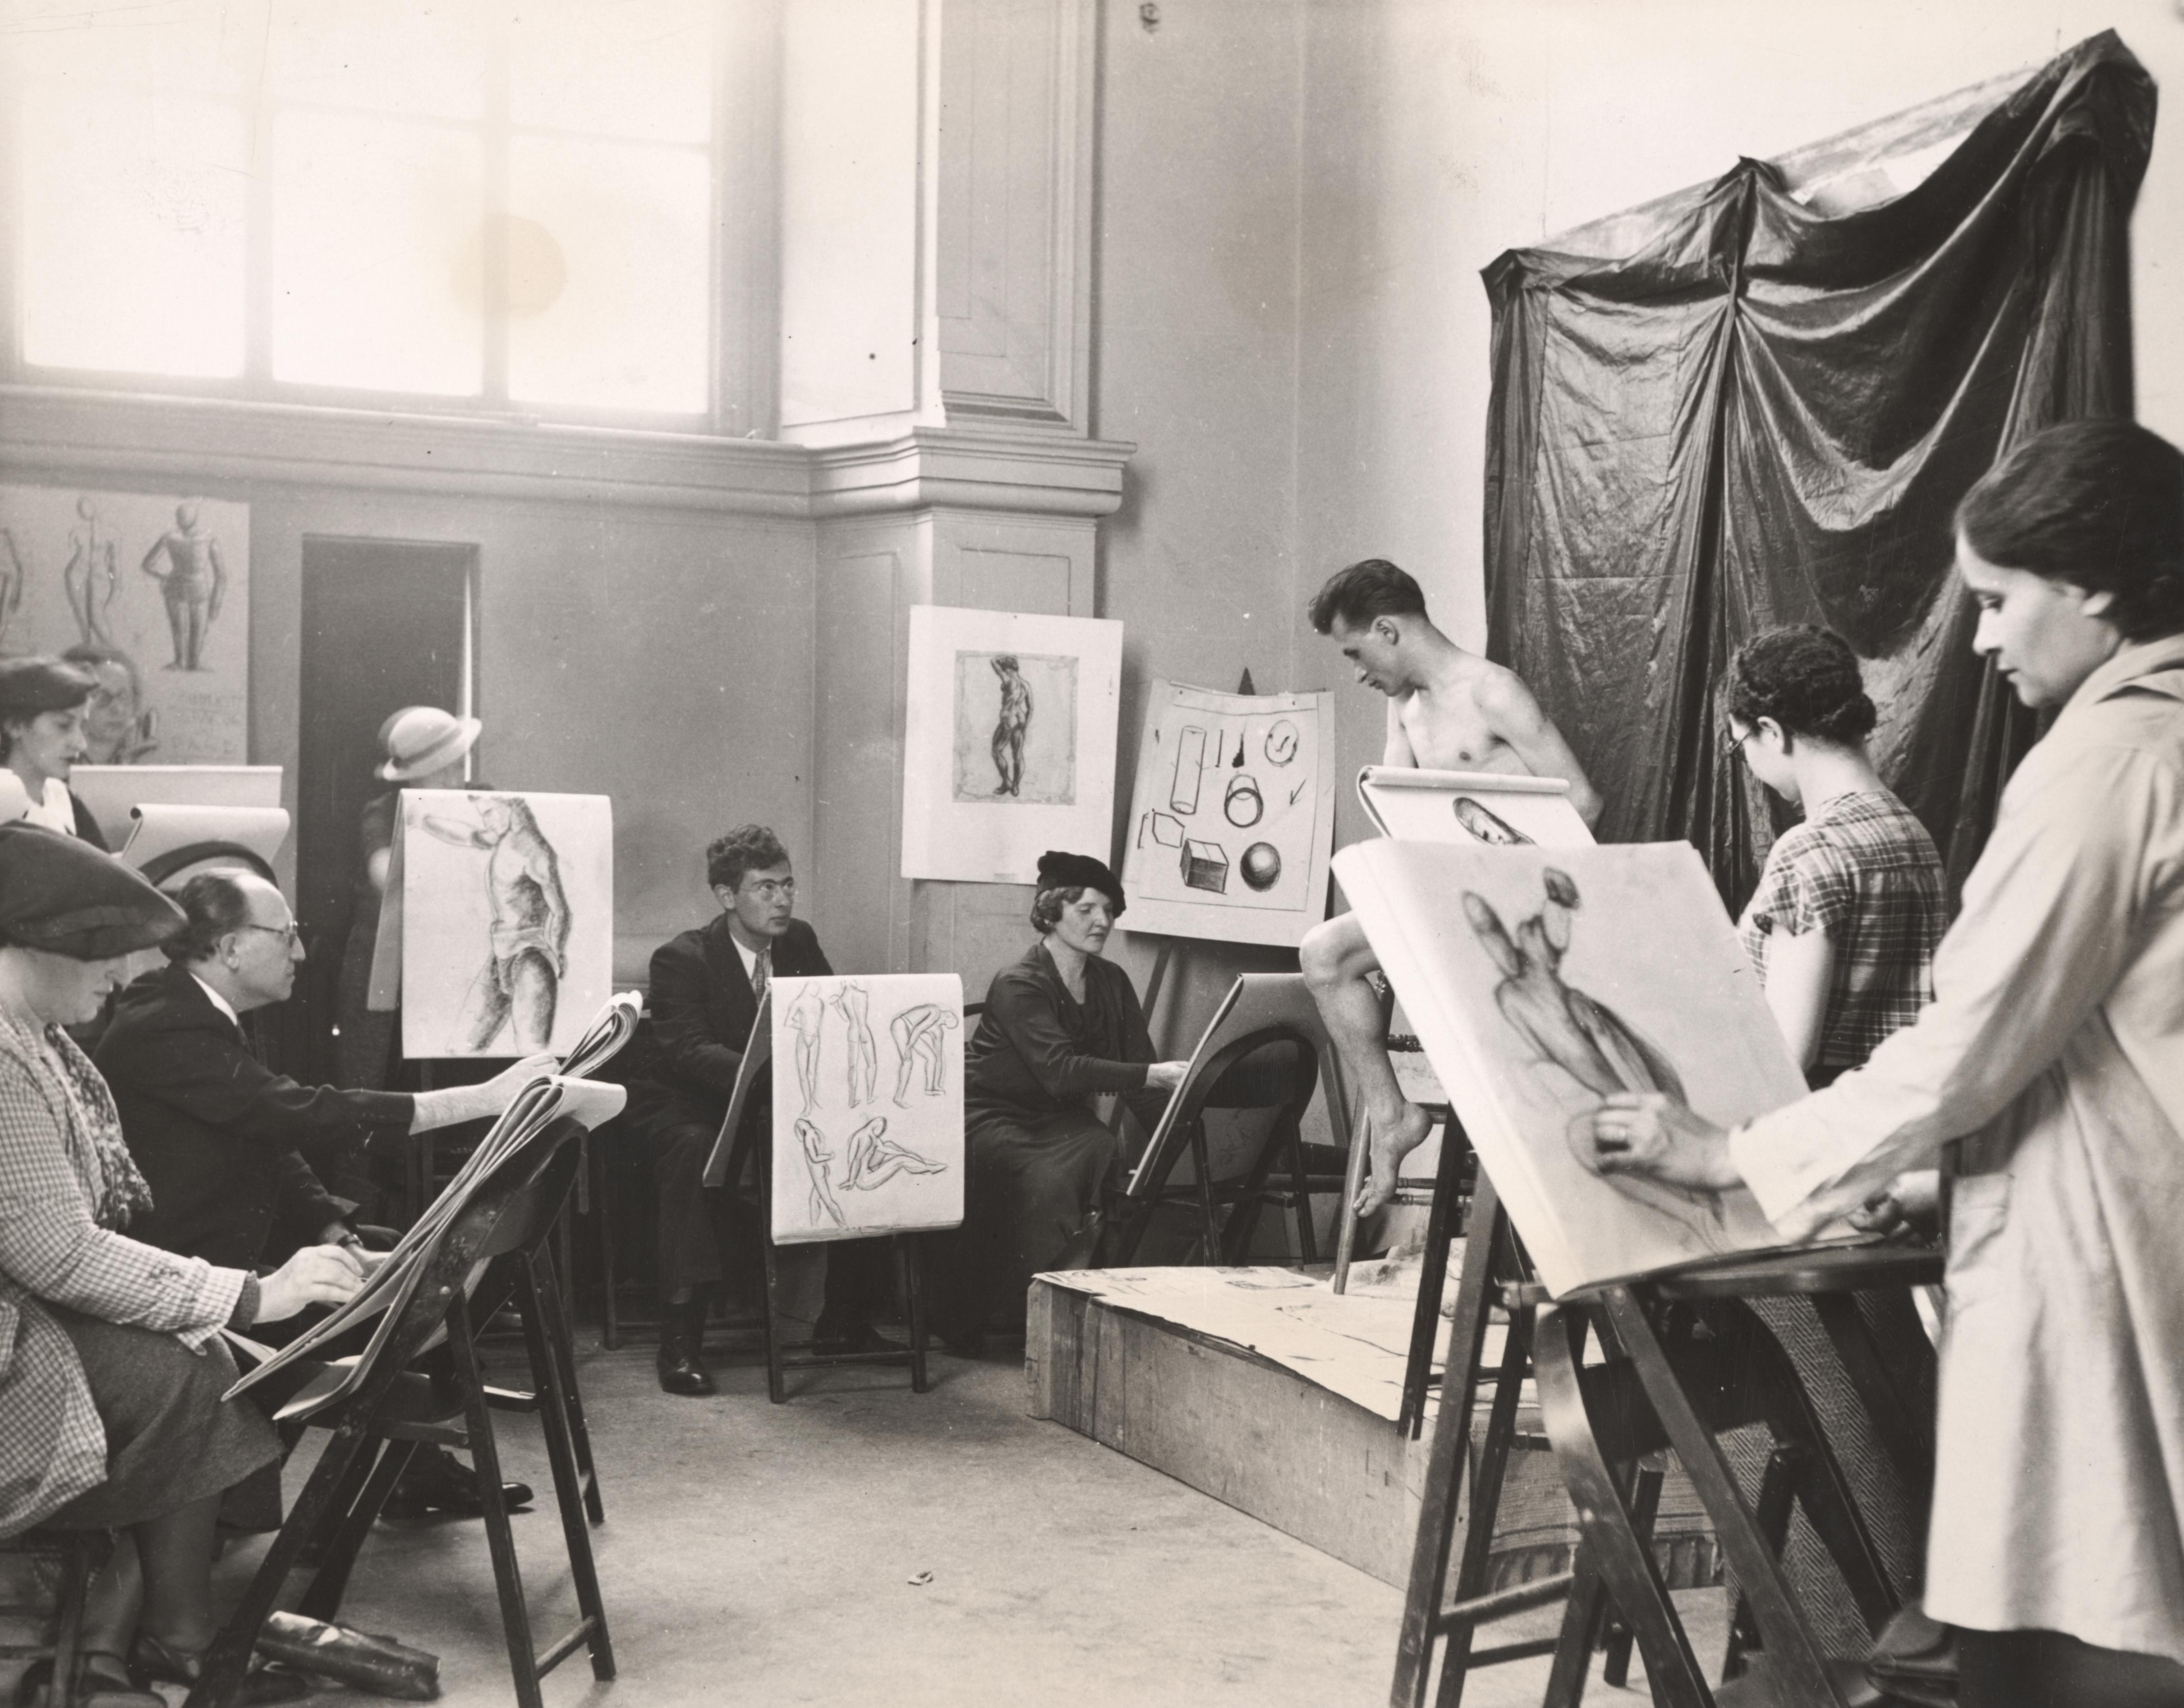 Bezalel Academy Of Arts And Design History